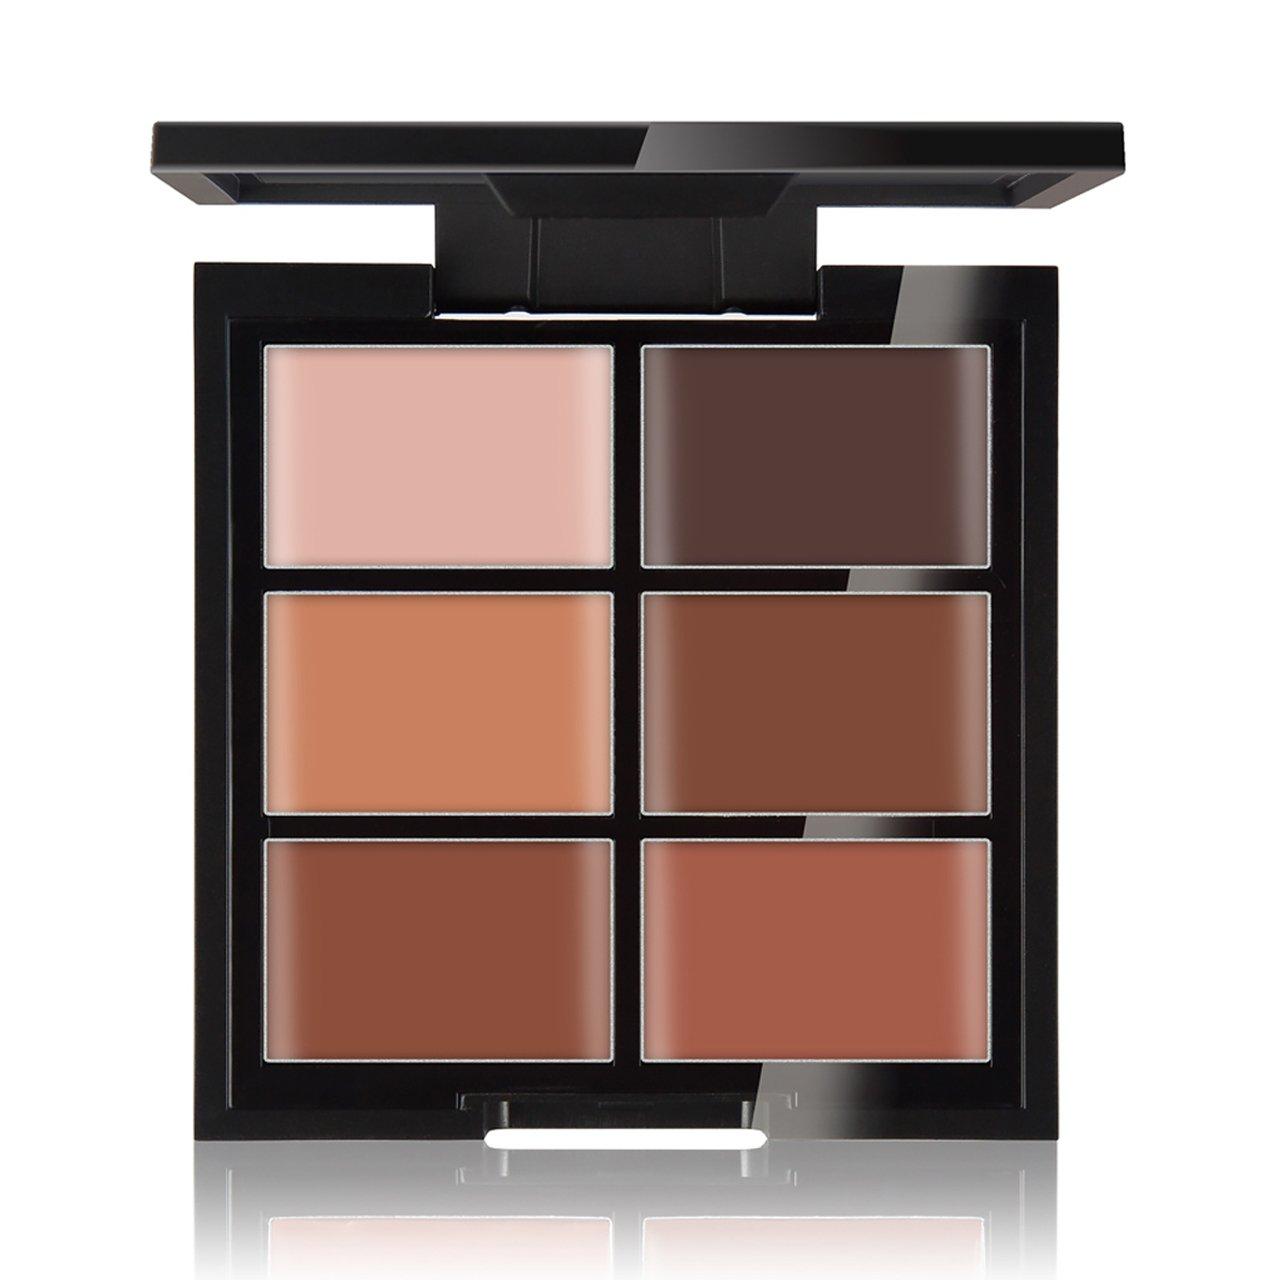 CCbeauty Cream Concealer Contour Palette Makeup Highlighter and Makeup Color Face& Eye Dark Circle Corrector Kit (Deep)